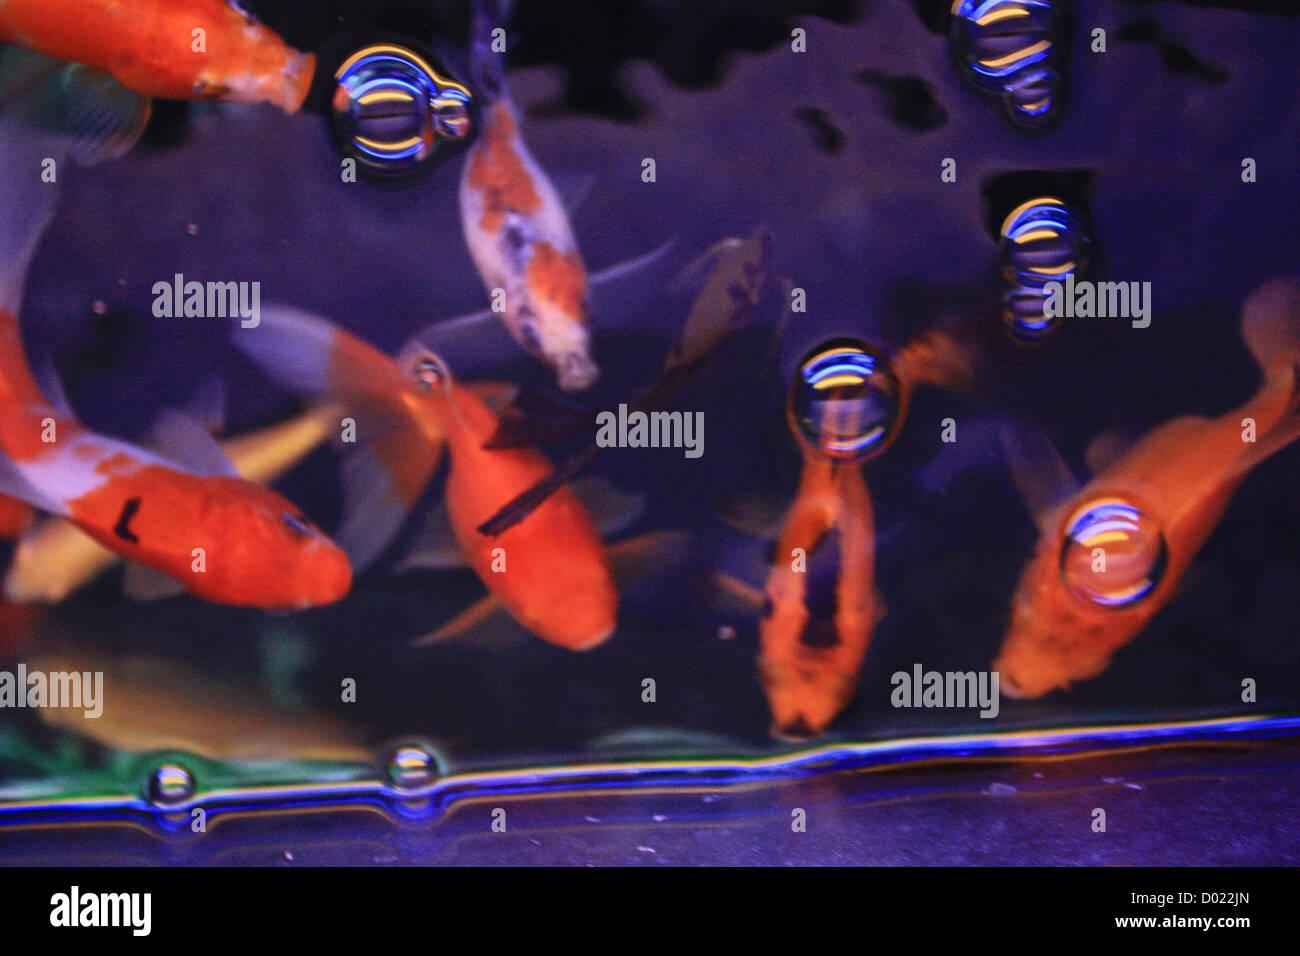 freshwater fish, aquarium fish, tropical fish, pictures of fish